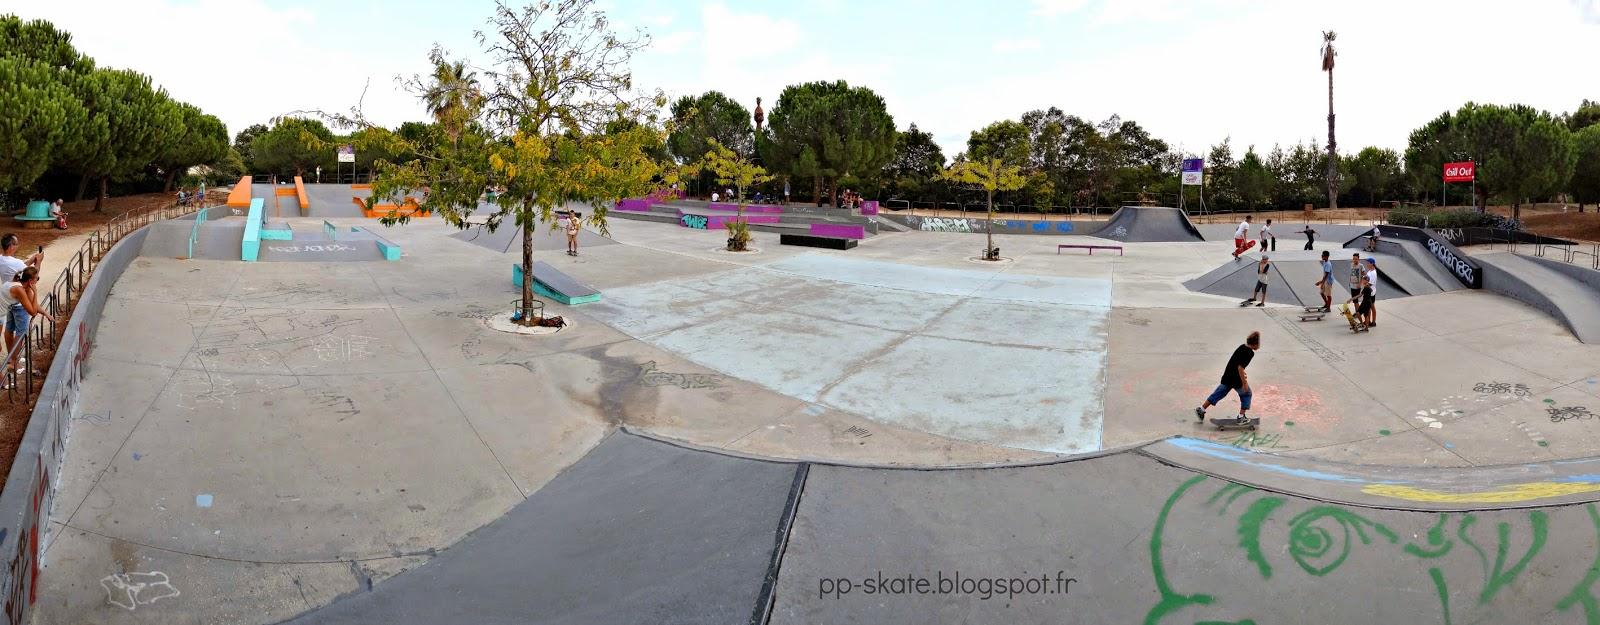 Skatepark Hyères panoramique